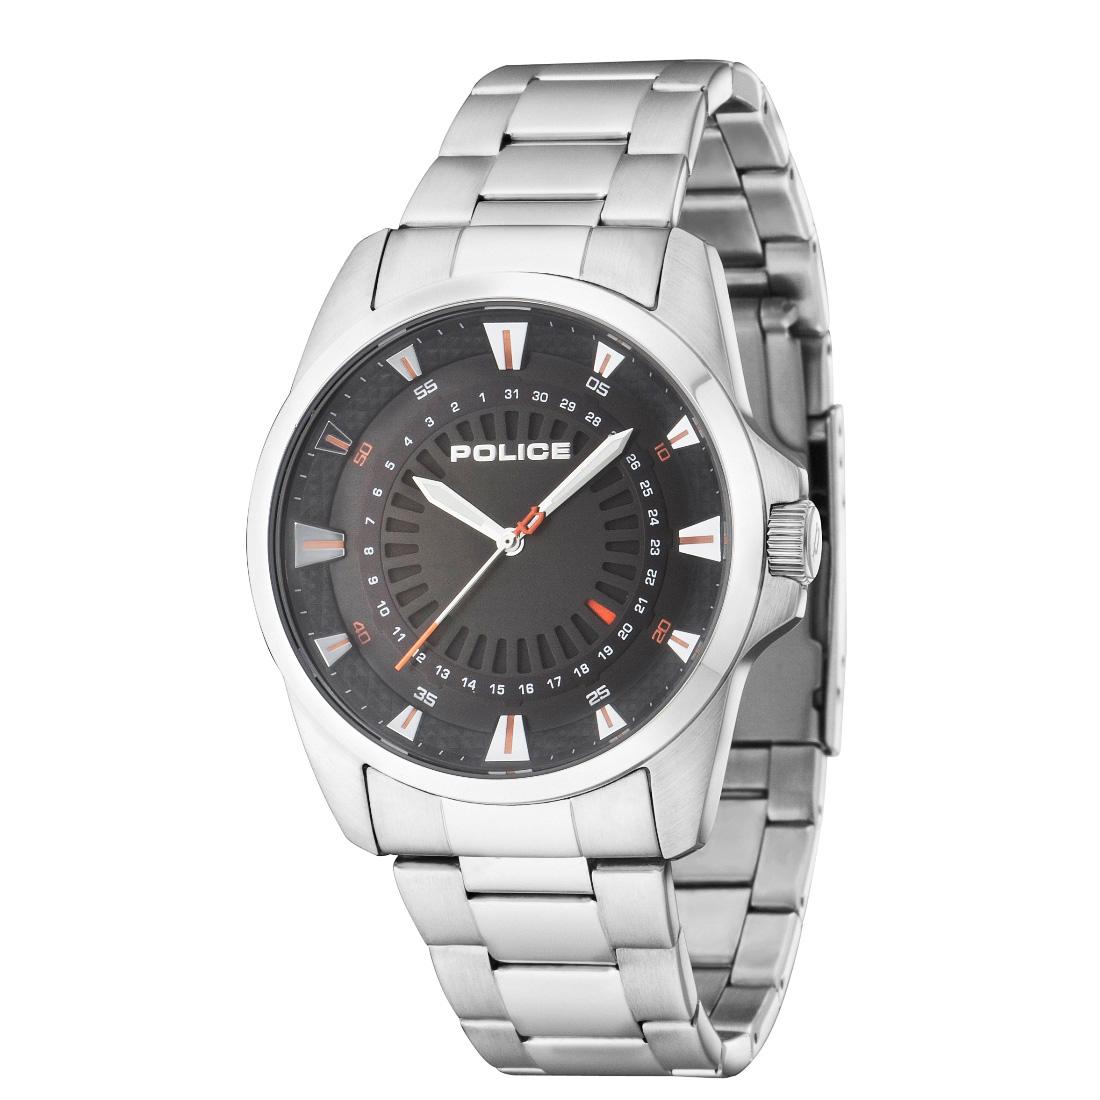 POLICE(ポリス)時計 RADIANTOラディアント ブラック【14527JS-02M】